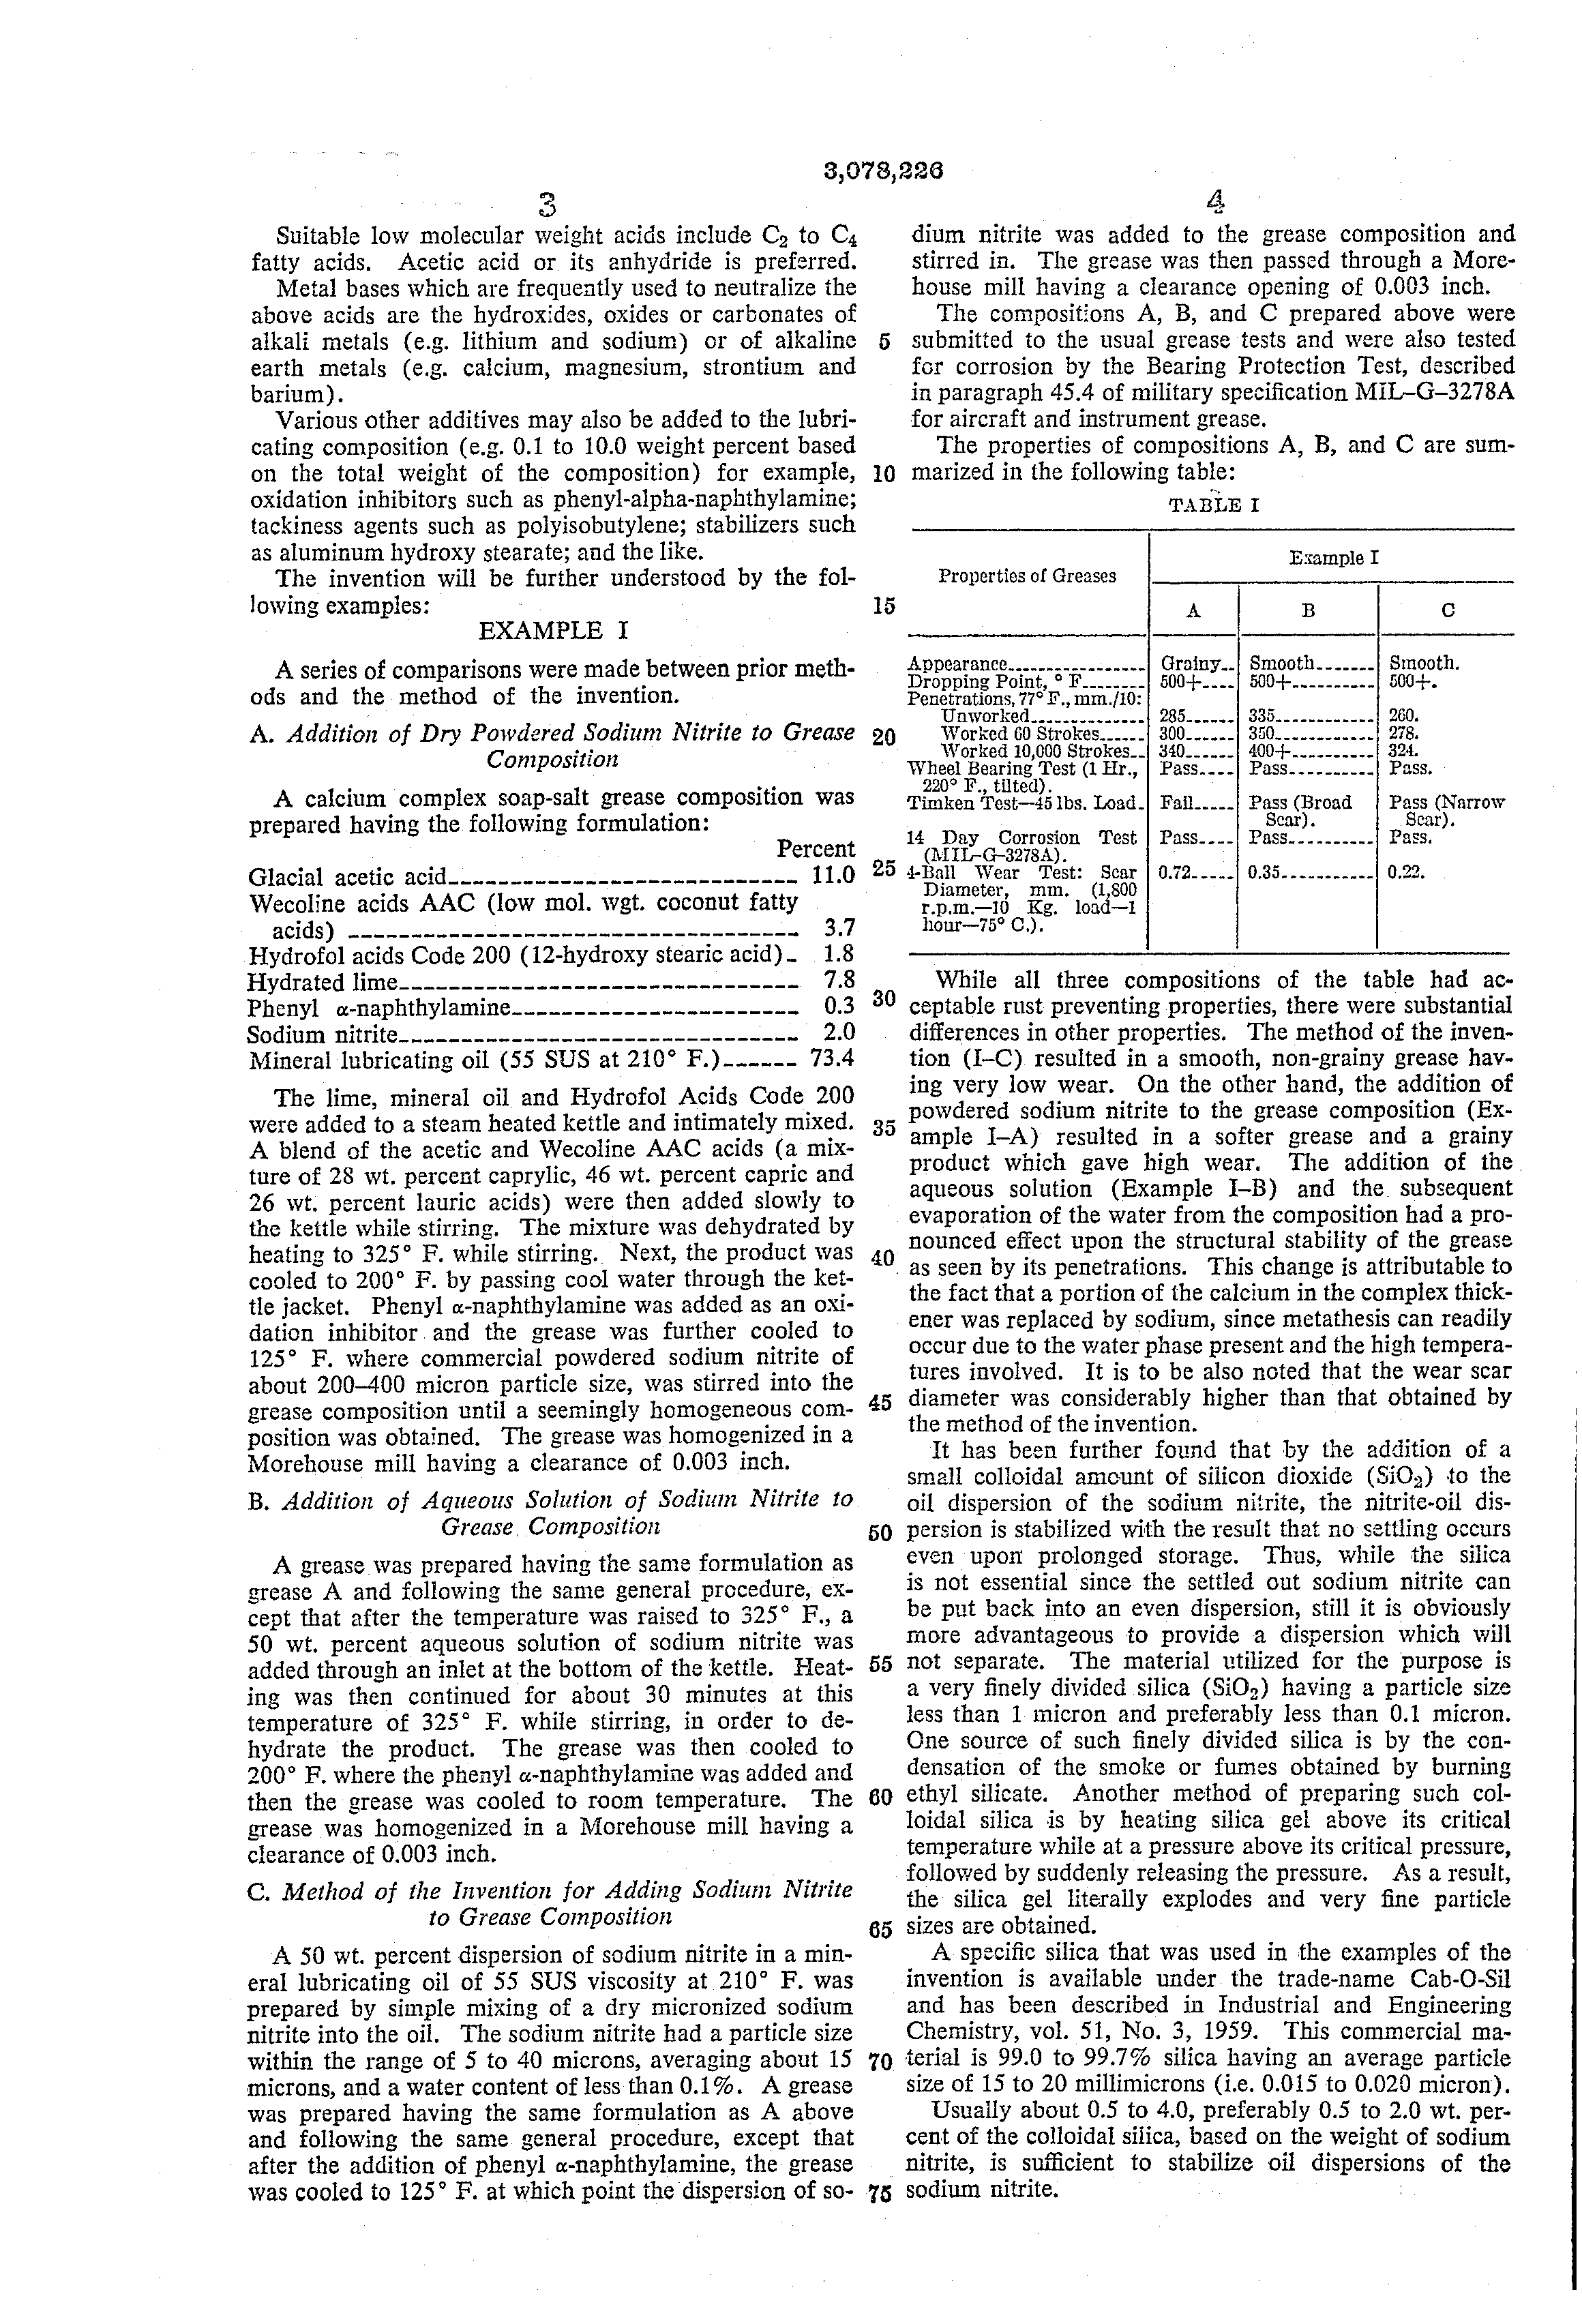 Patent Us3078226 Method For Dispersing Sodium Nitrite In Grease